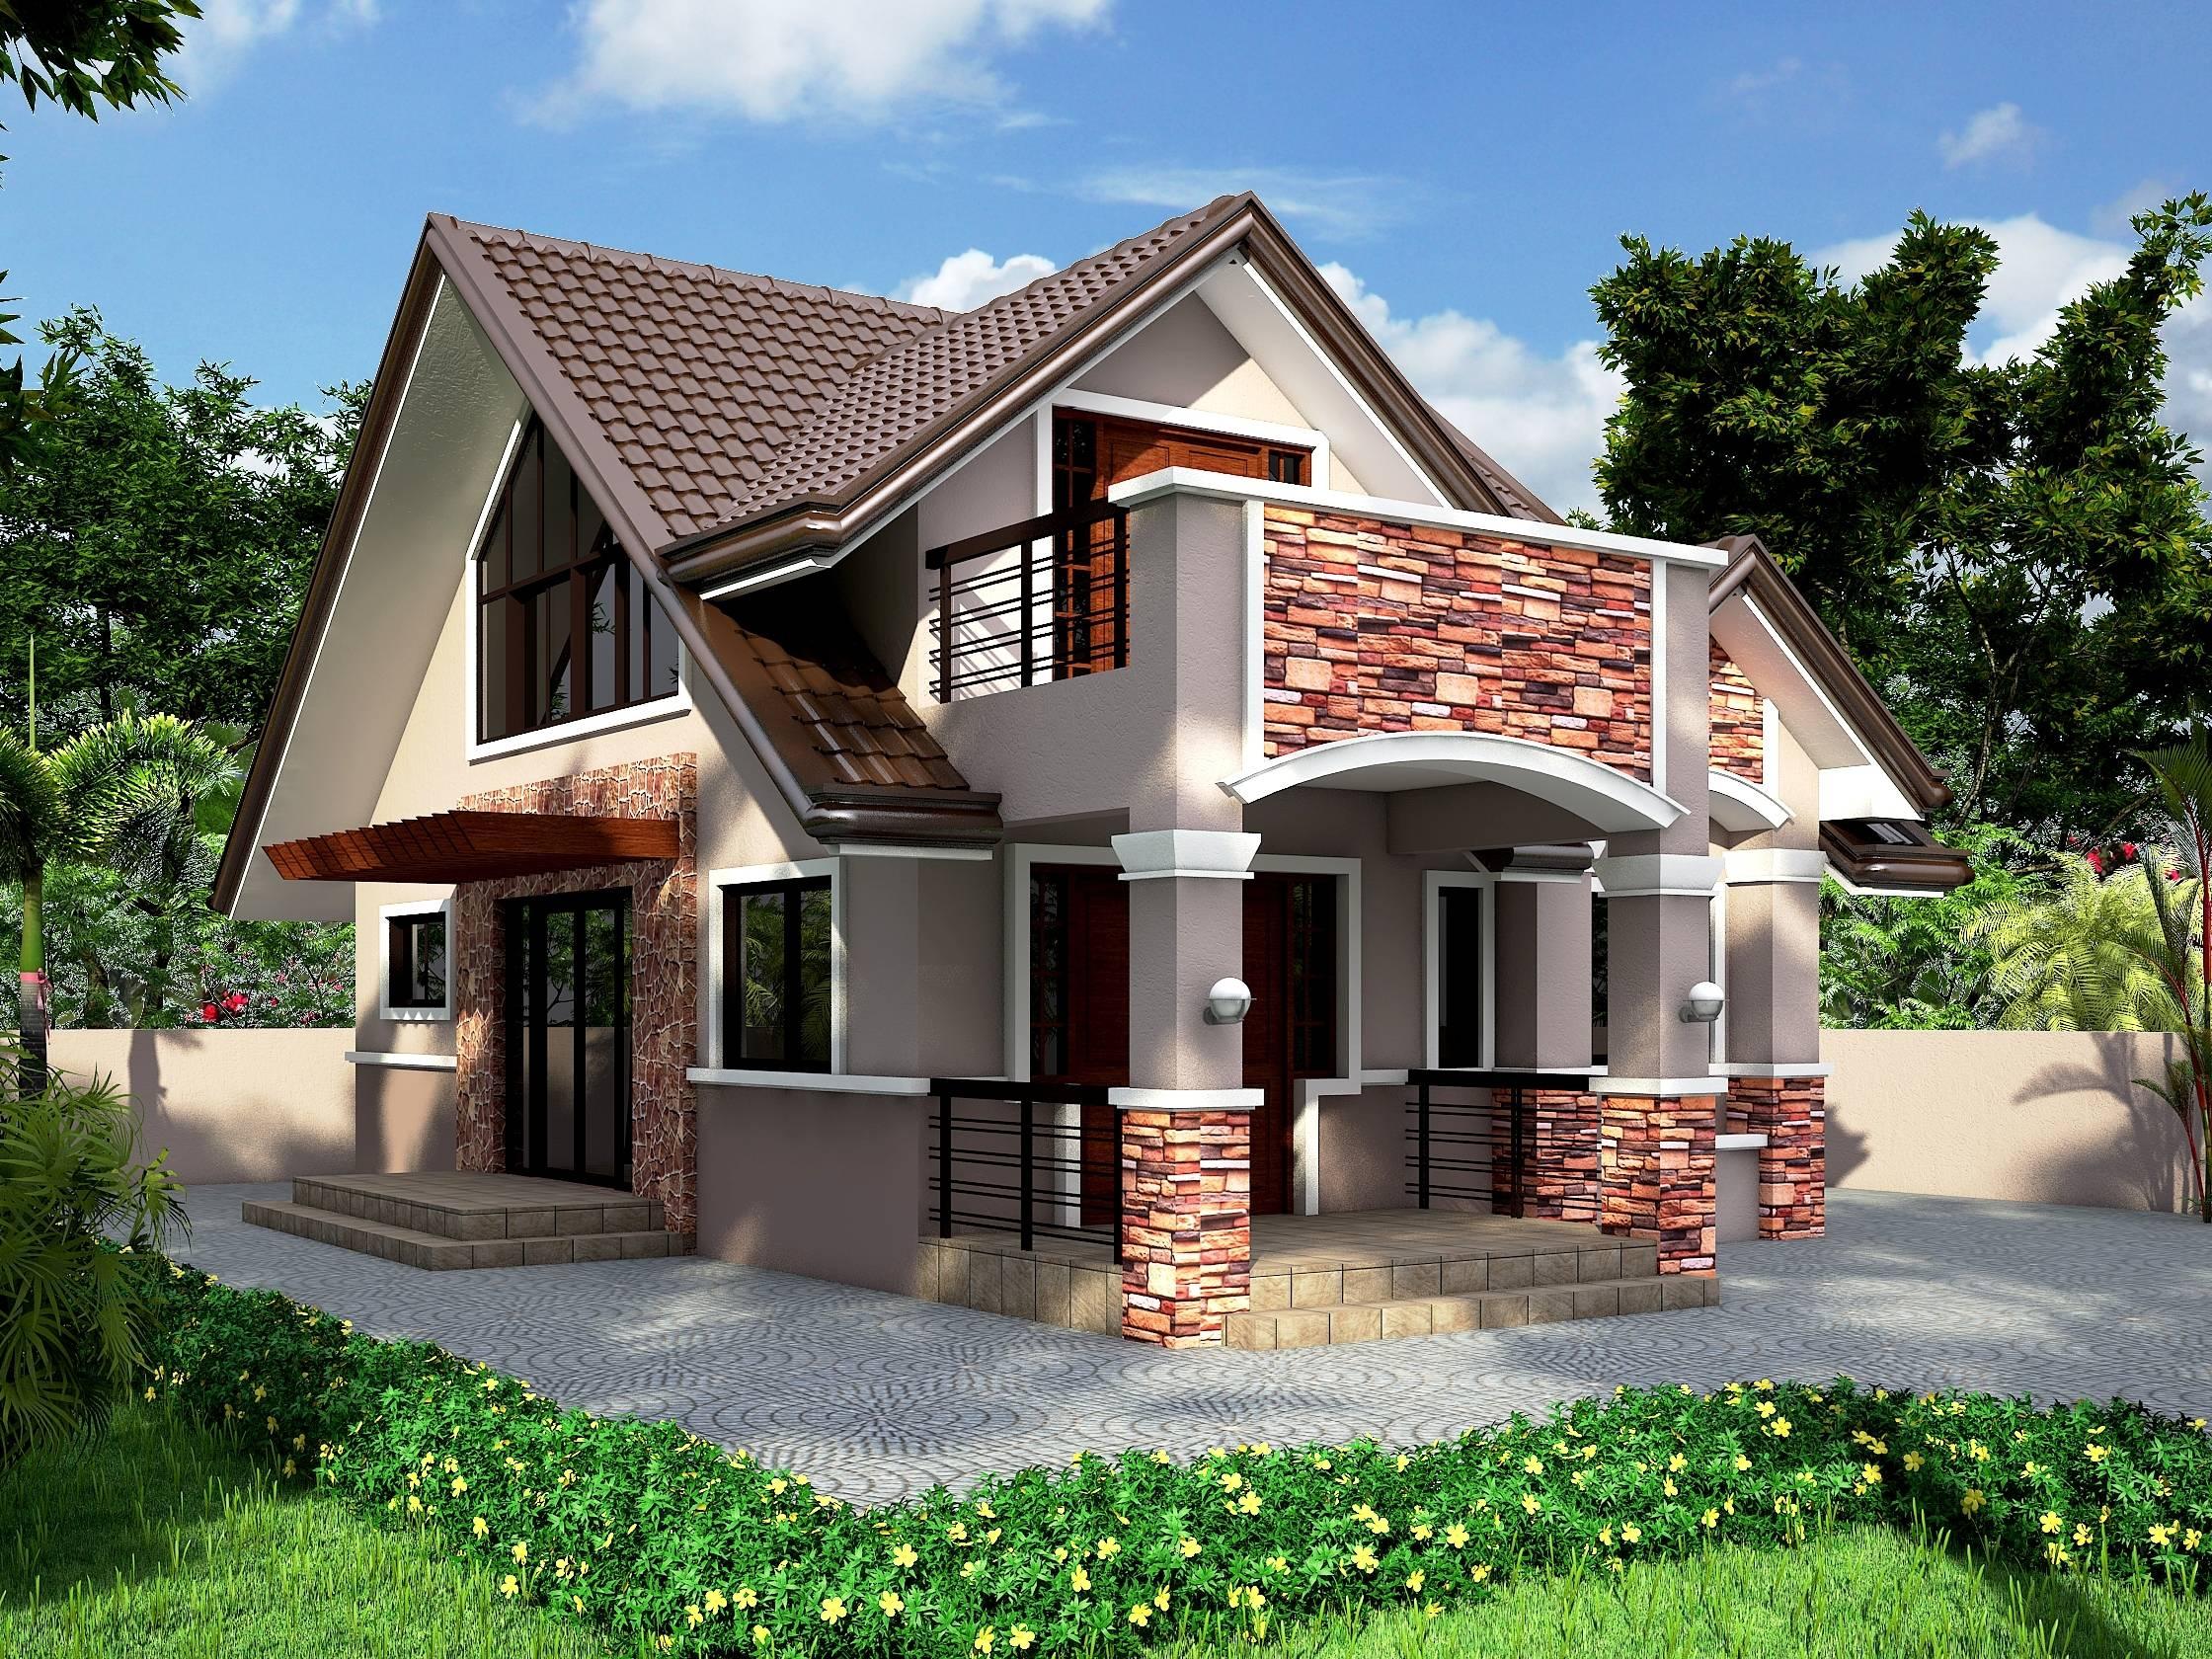 Attic House Design Philippines - House Plans | #154585